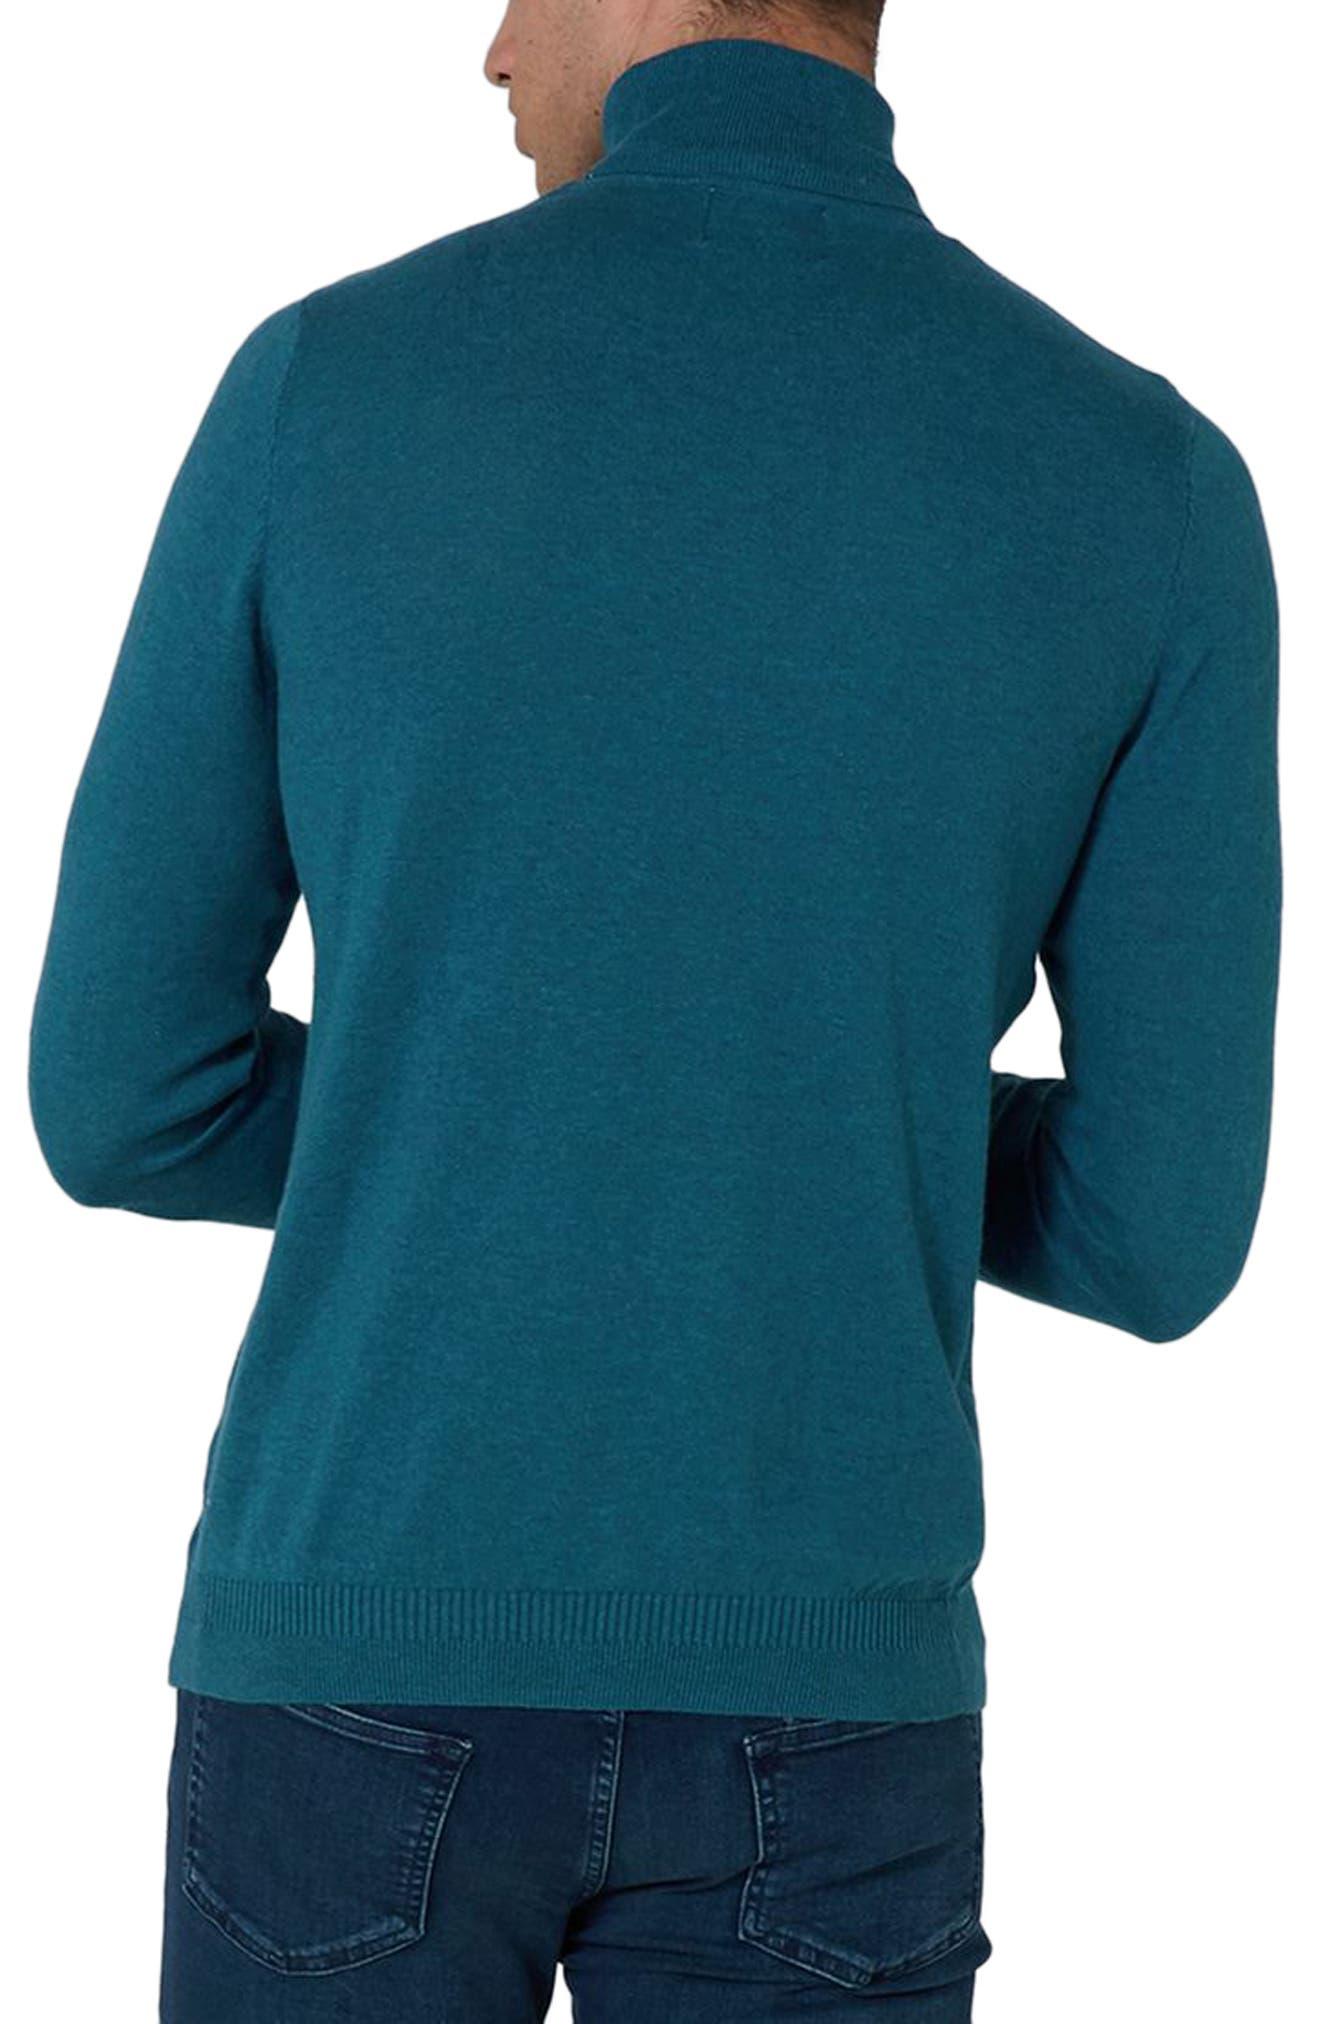 Cotton Turtleneck Sweater,                             Alternate thumbnail 5, color,